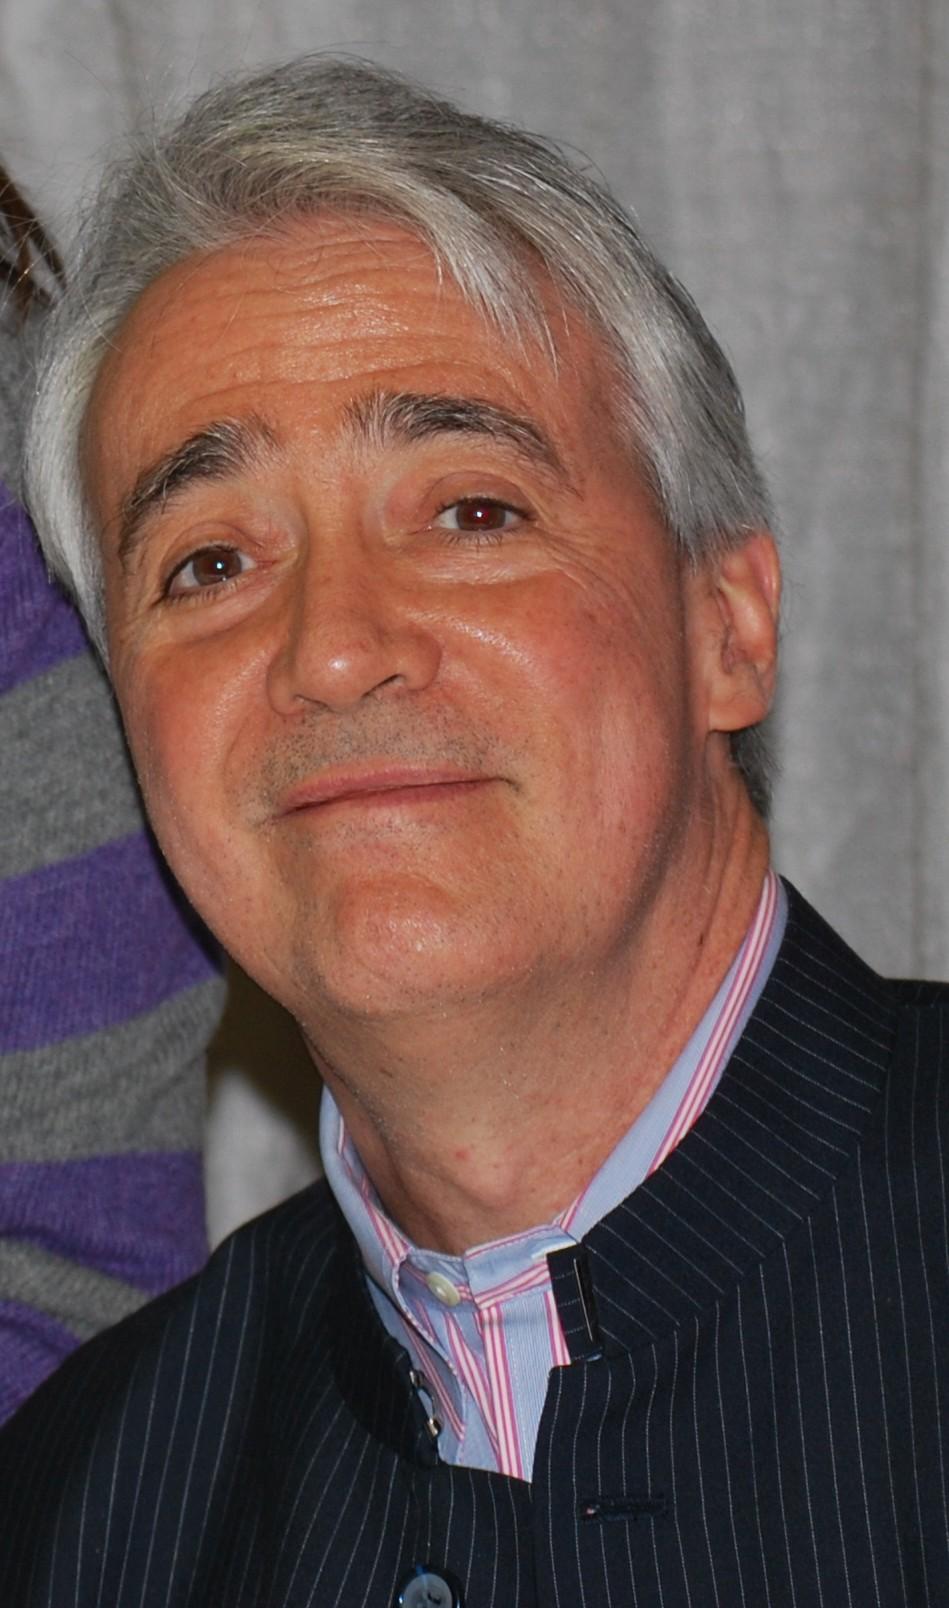 Simon in 2010